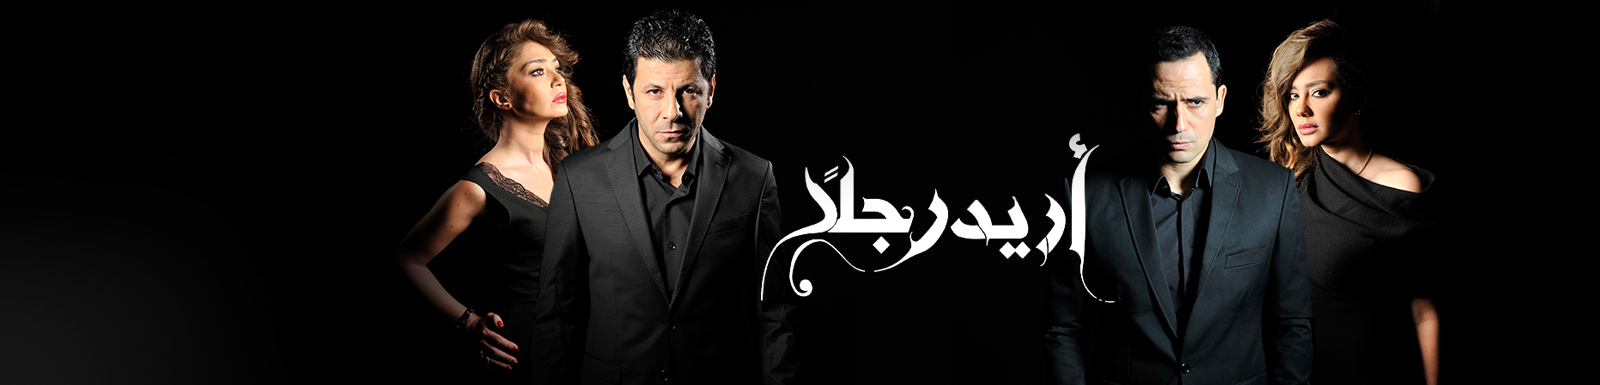 ����� ����� ���� ���� ������ 58 MBC shahid ���� ��